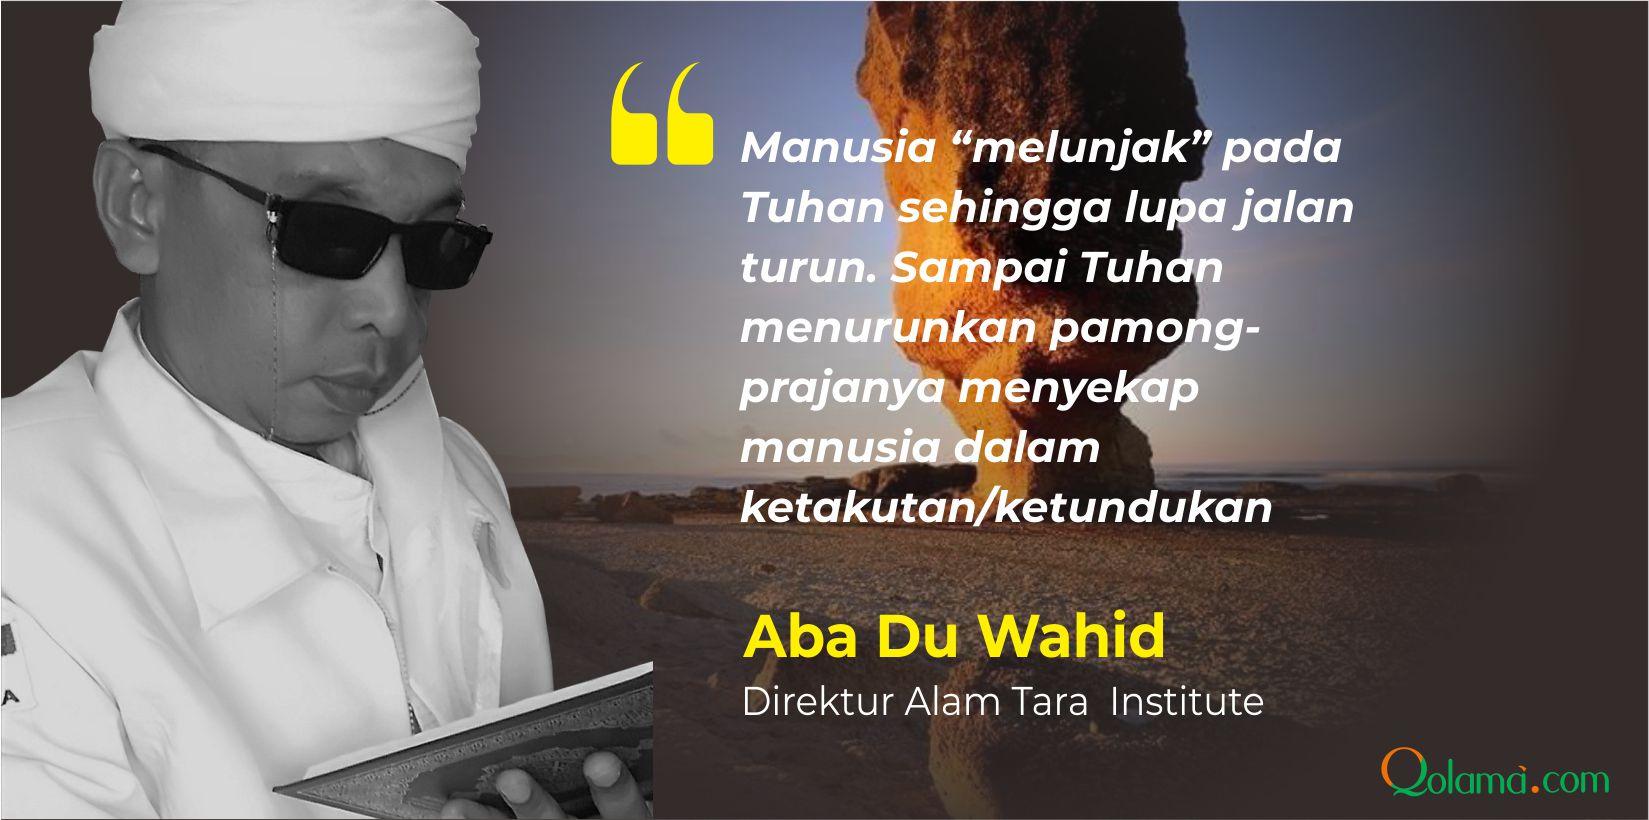 aba-du-wahid-qolama-opini